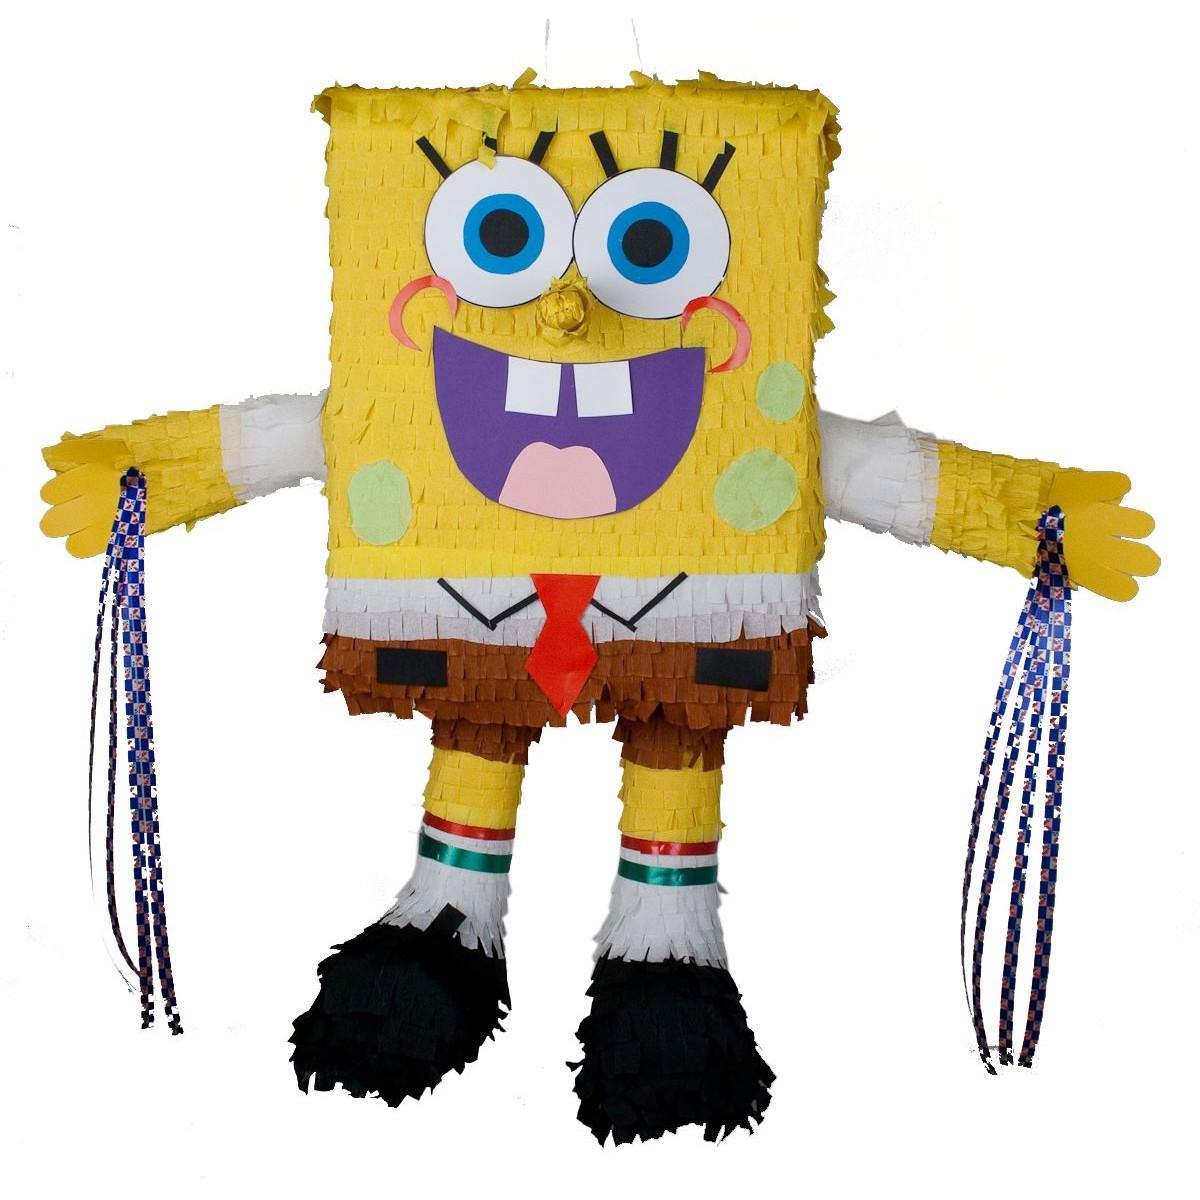 1200x1200 Spongebob Pinata Kaufen Im Mexiko 4 U Shop.